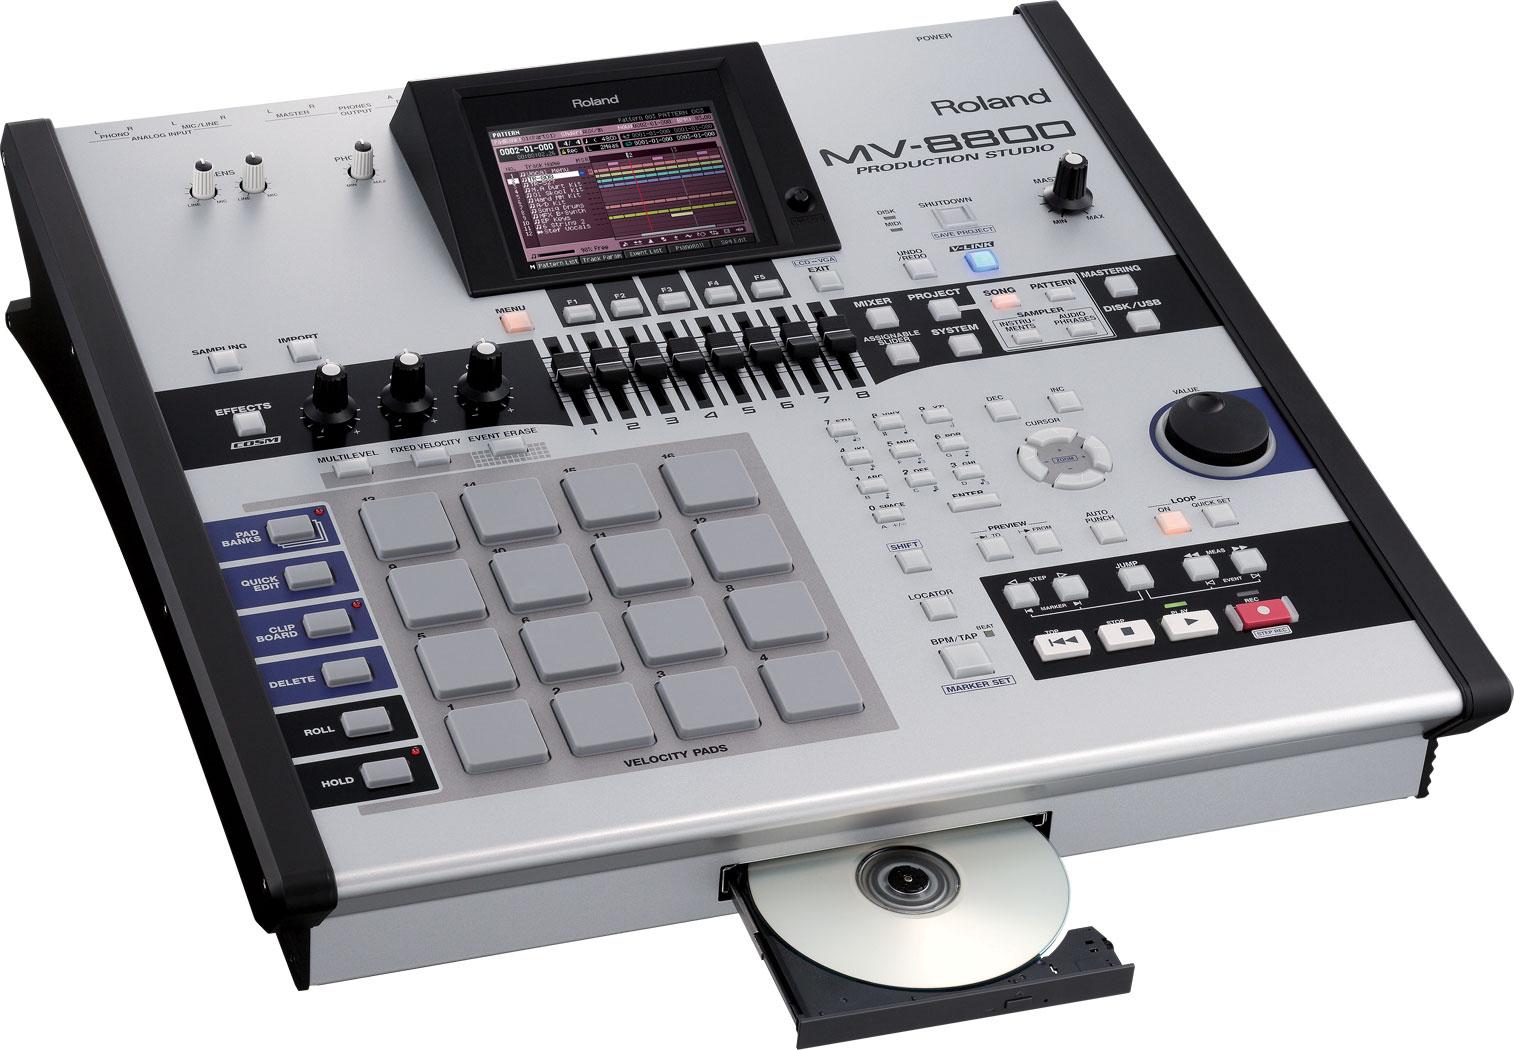 Roland - MV-8800 | Production Studio